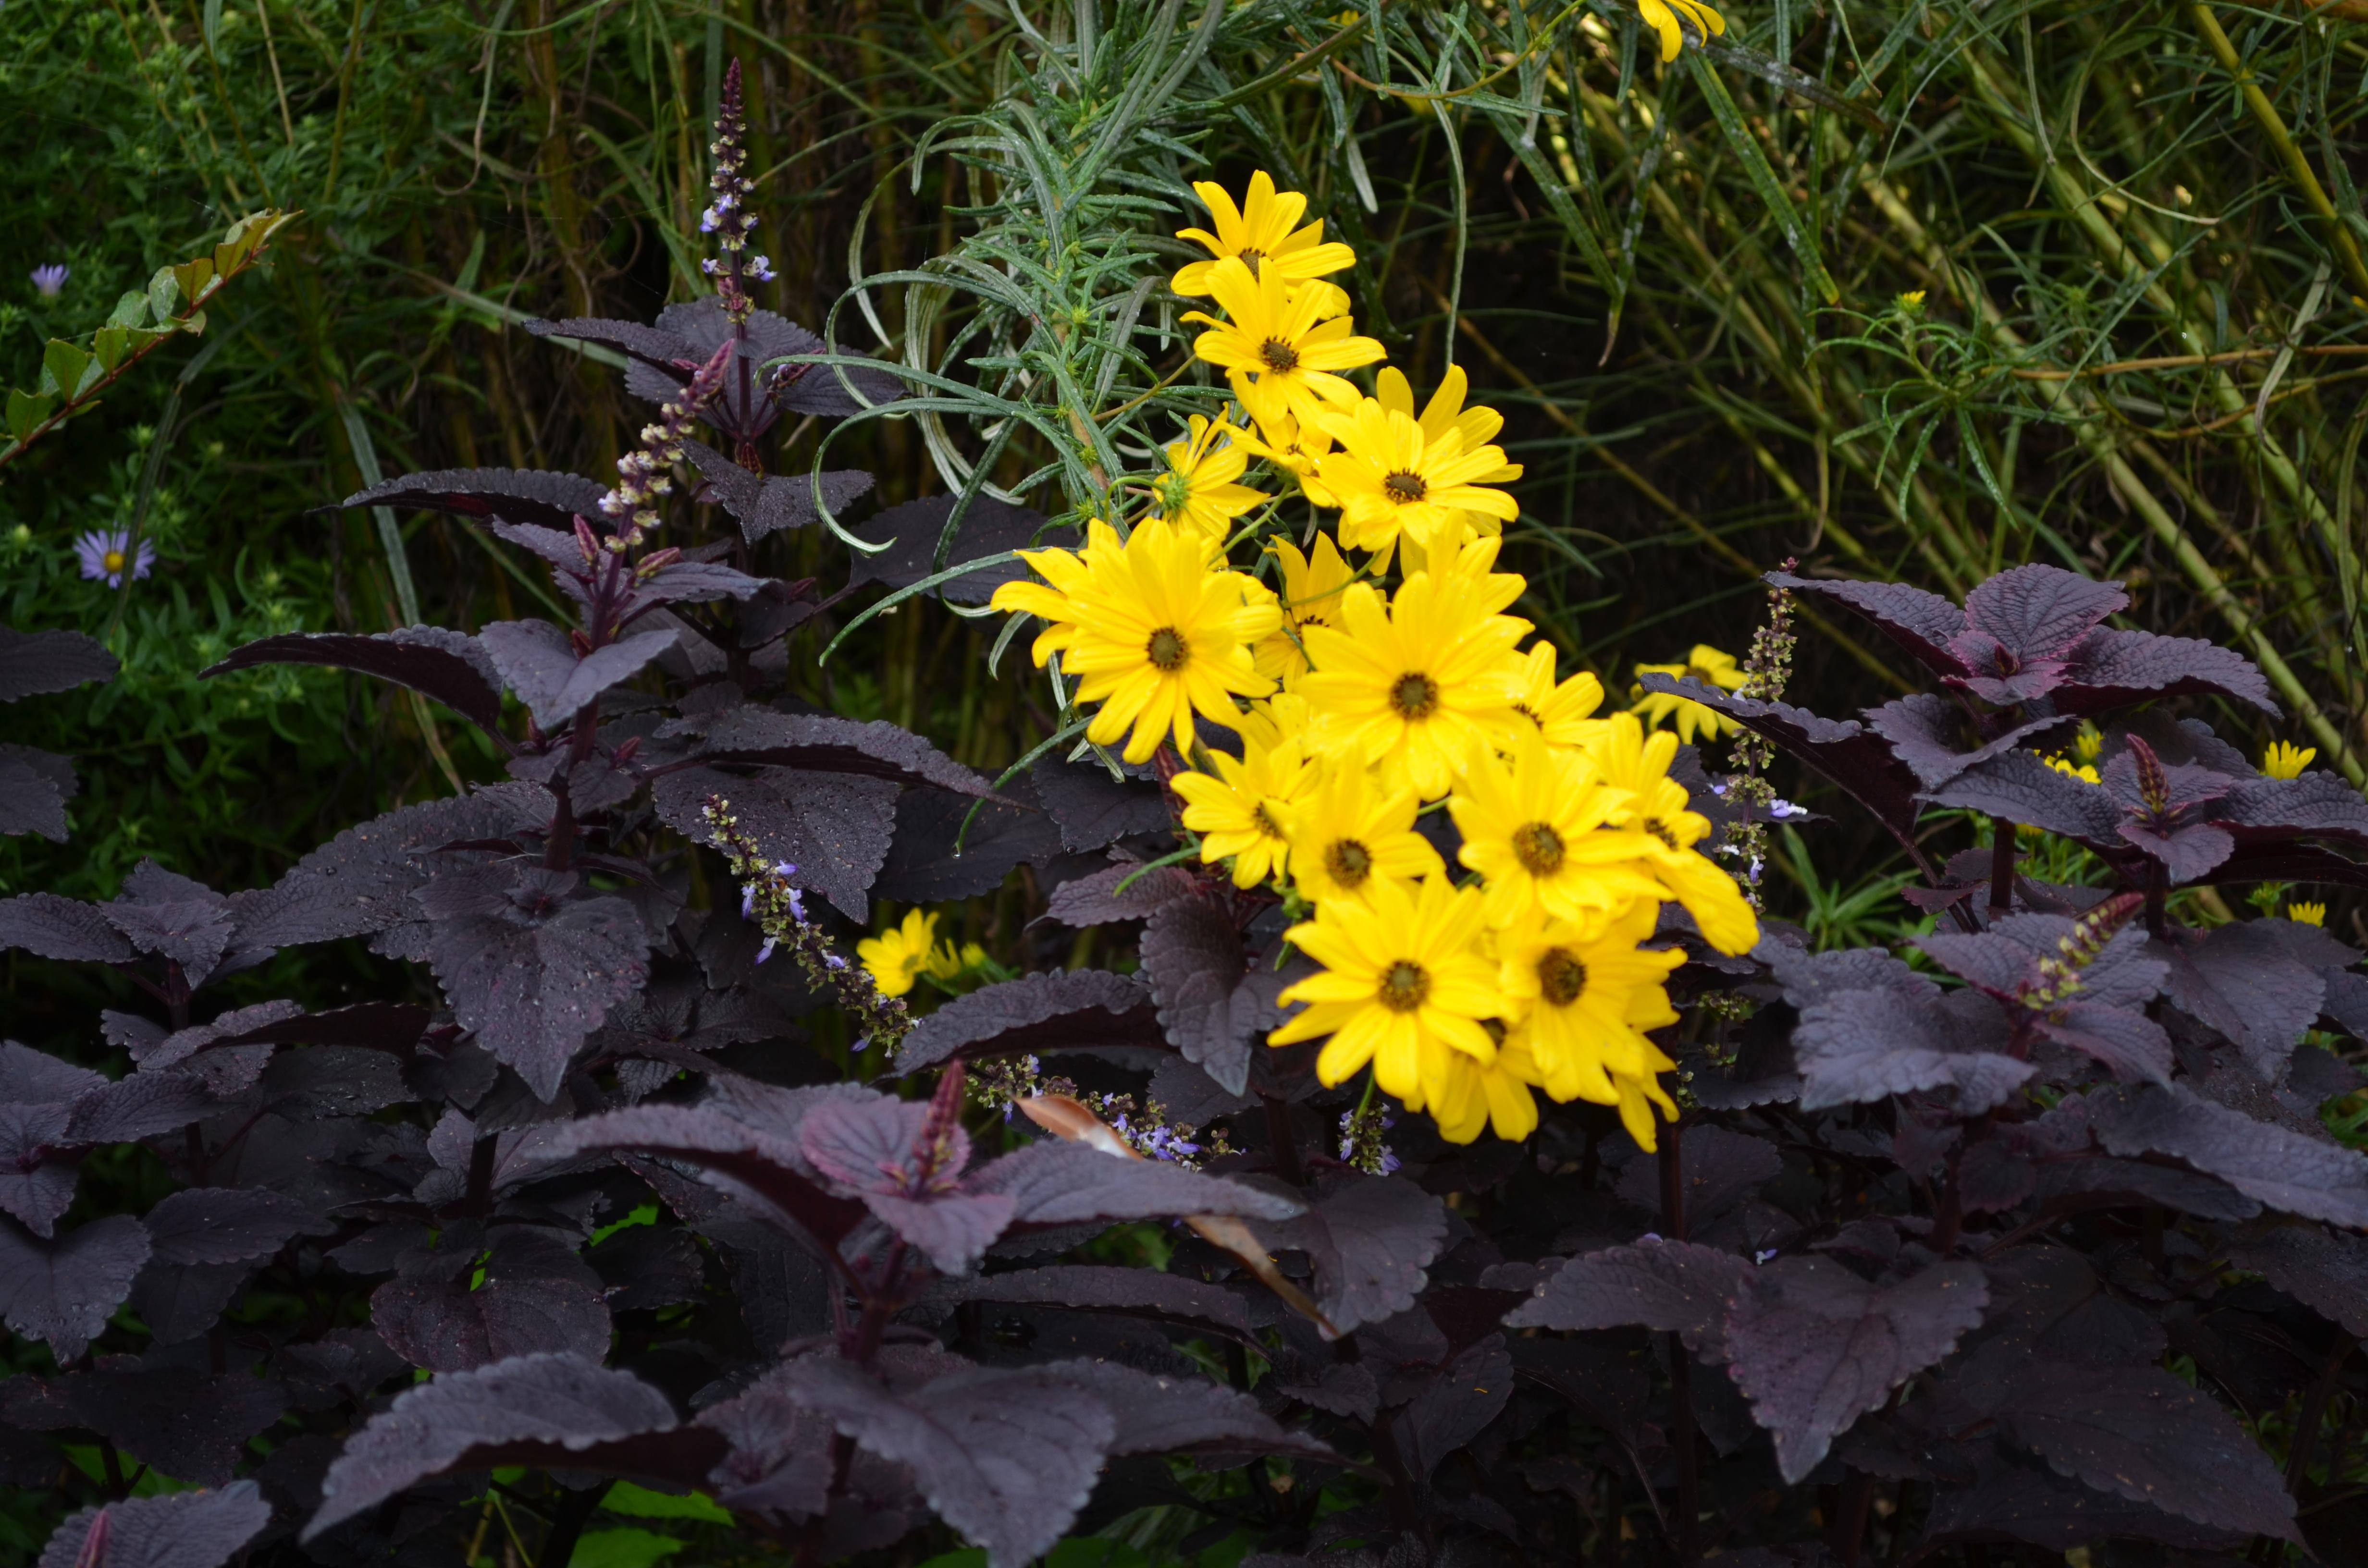 Narrow leaf sunflower